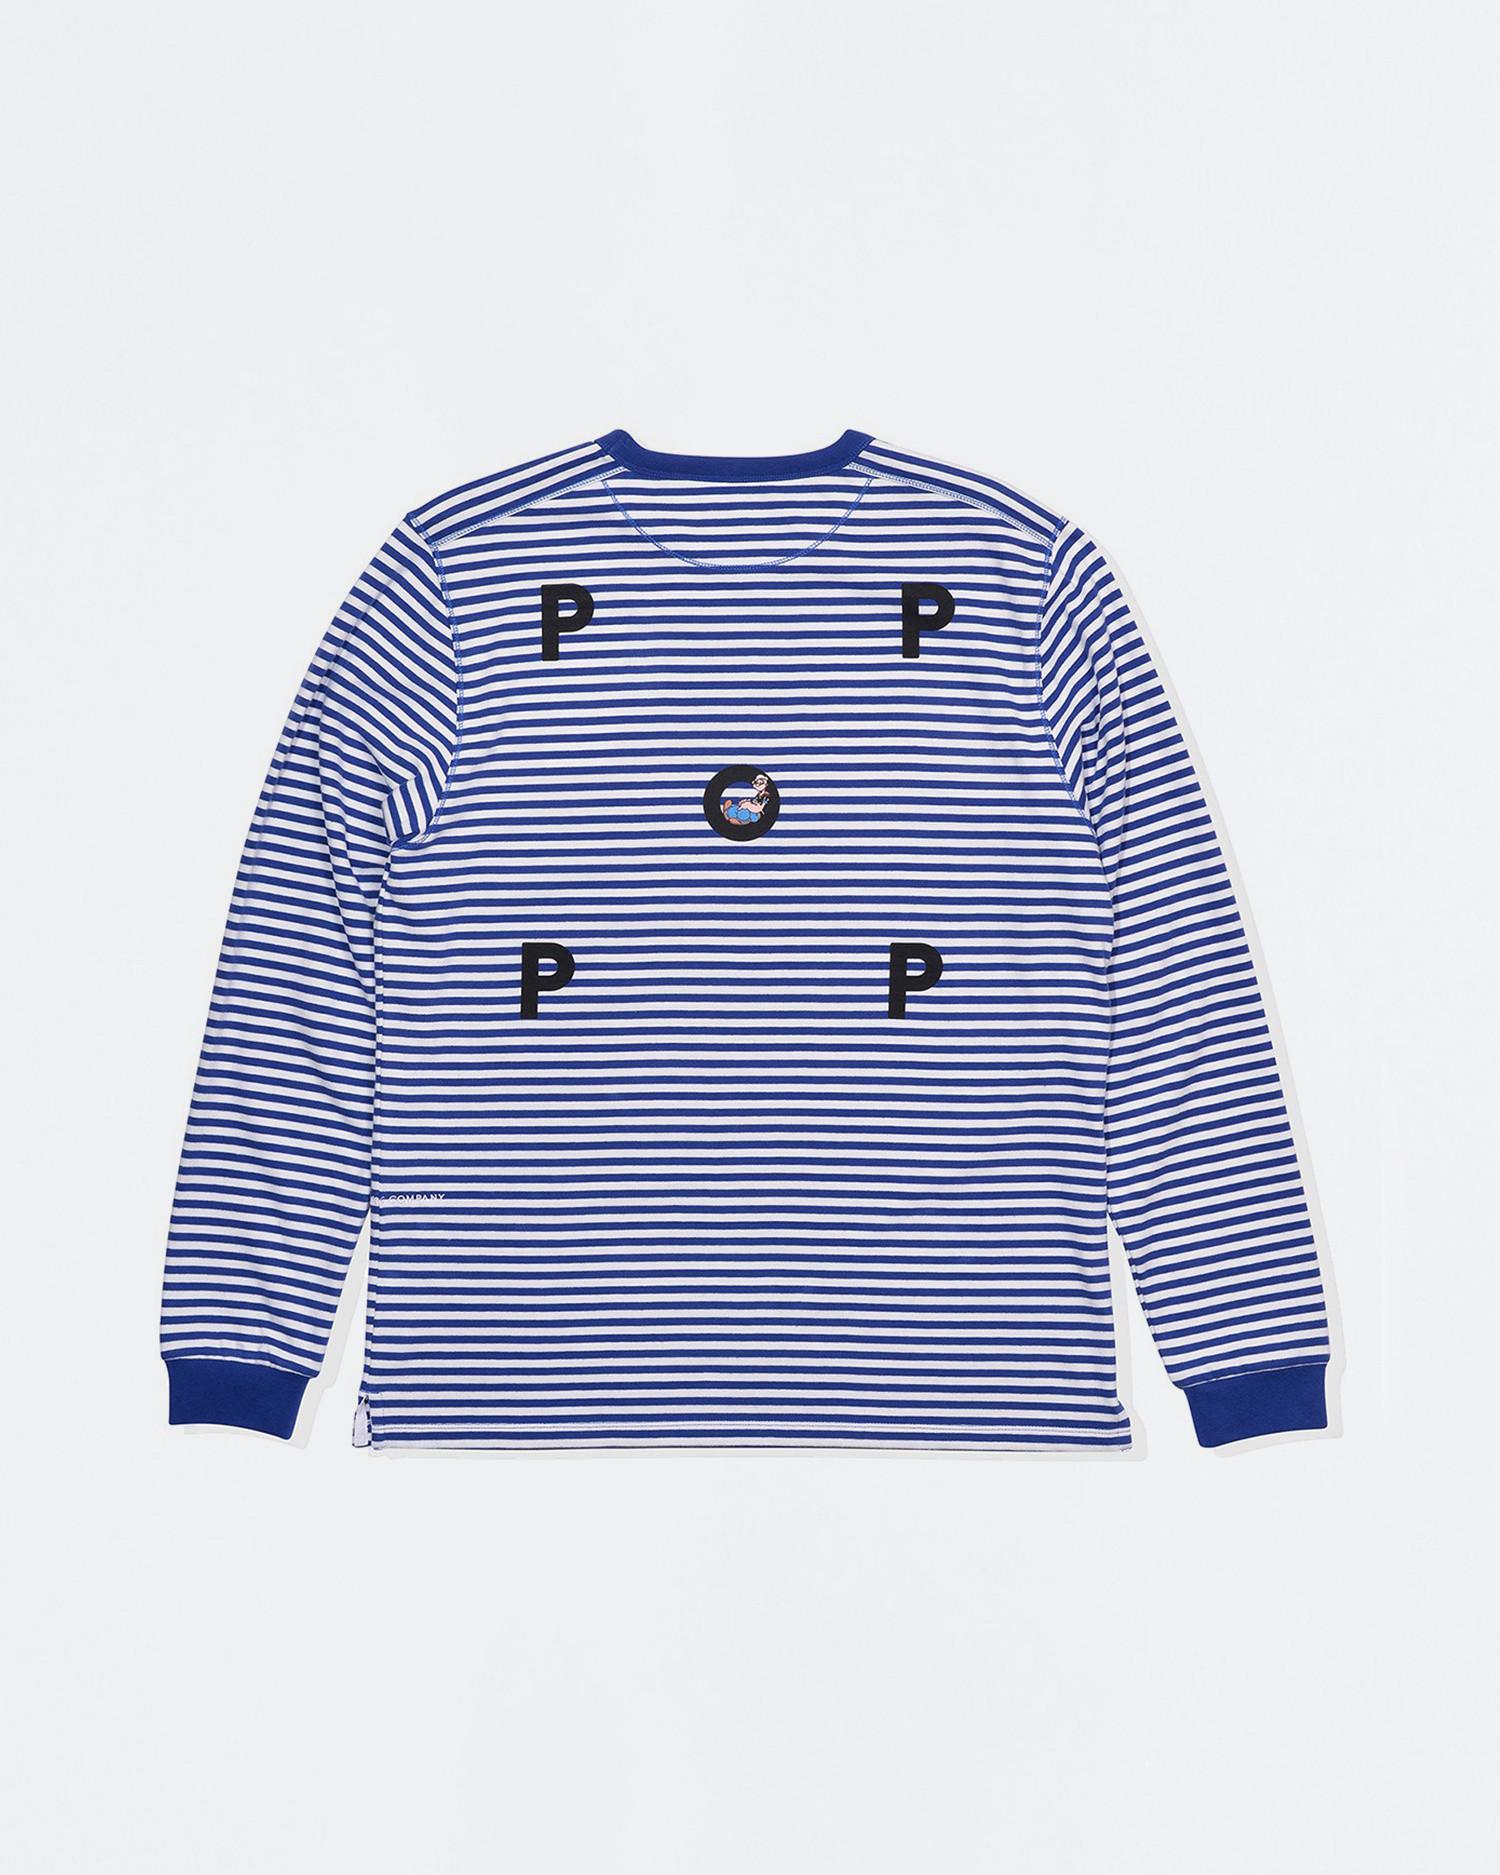 Pop Trading Co X Popeye striped longsleeve T-shirt royal/white